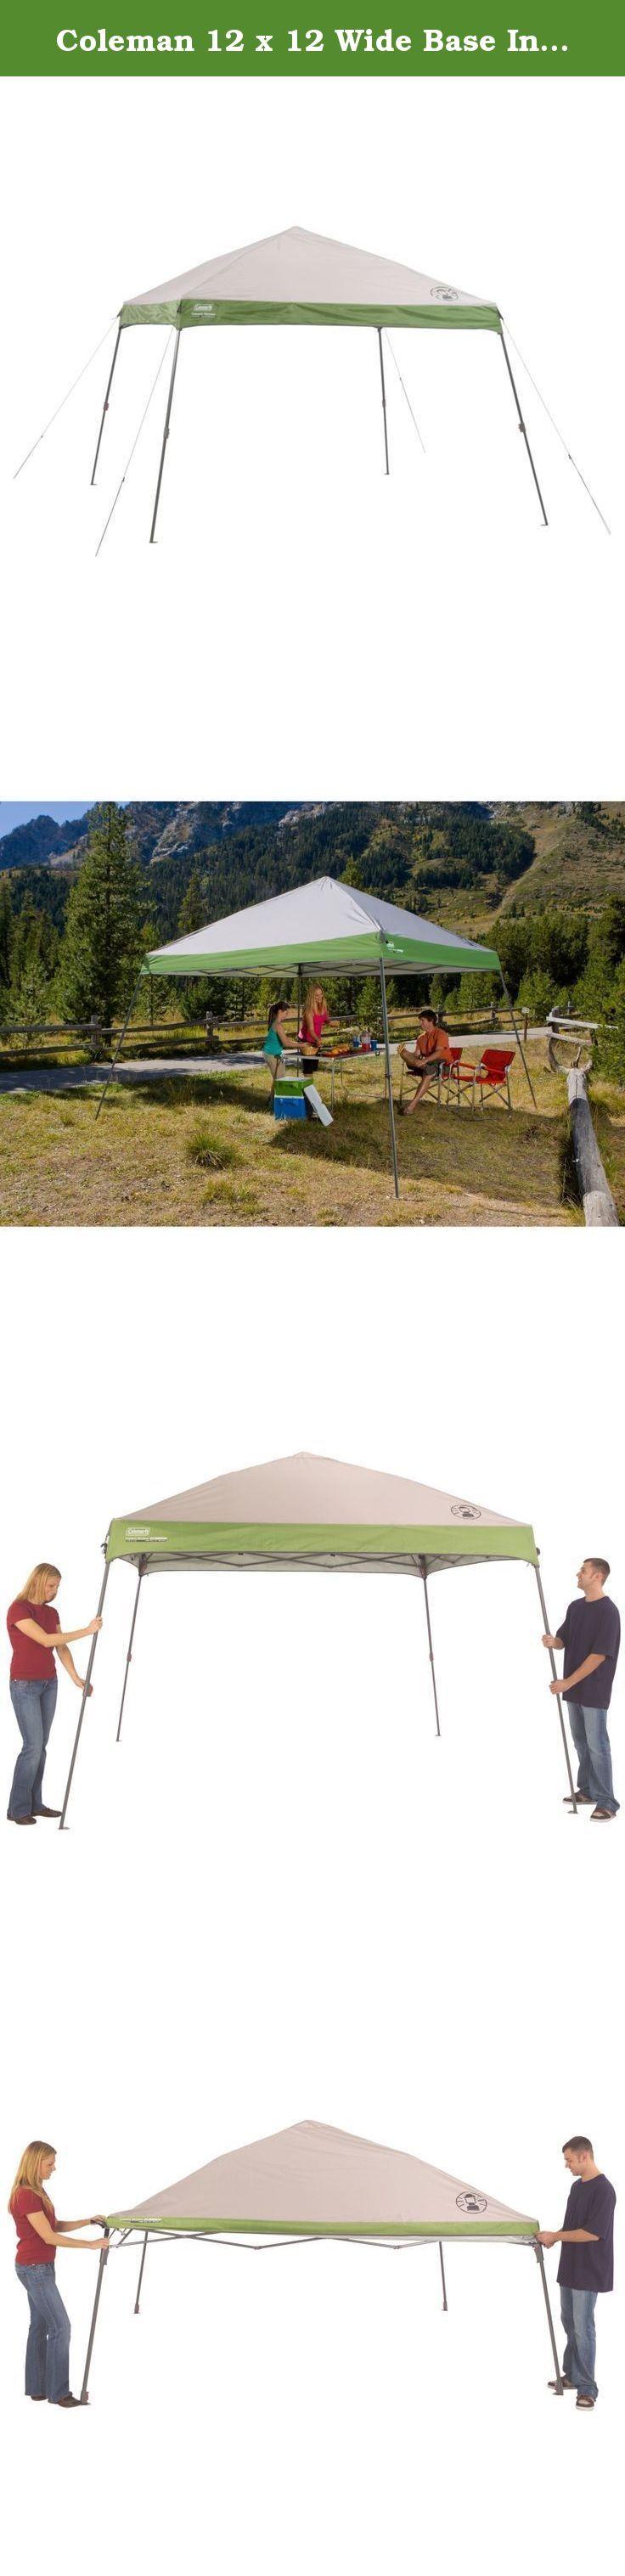 Coleman 12 x 12 Wide Base Instant Canopy. Coleman Shelter Tent, 12ft. x 12ft. Slant 187407.